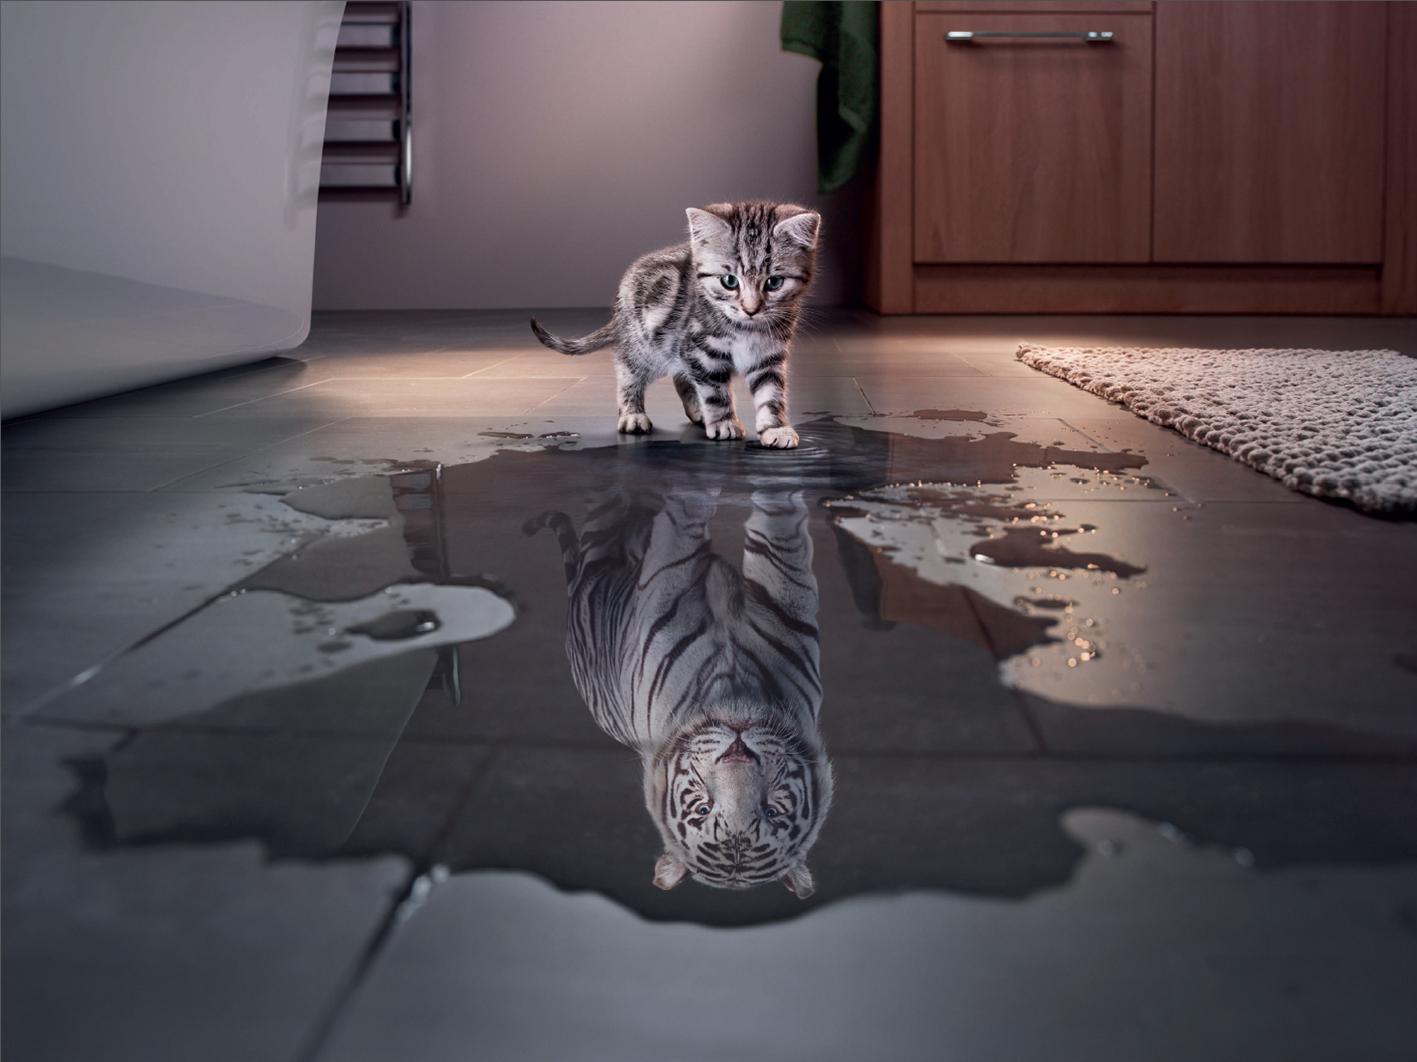 Cute Kitten Wallpaper For Ipad Animal Cat Funny Cute White Tiger Tiger Kitten